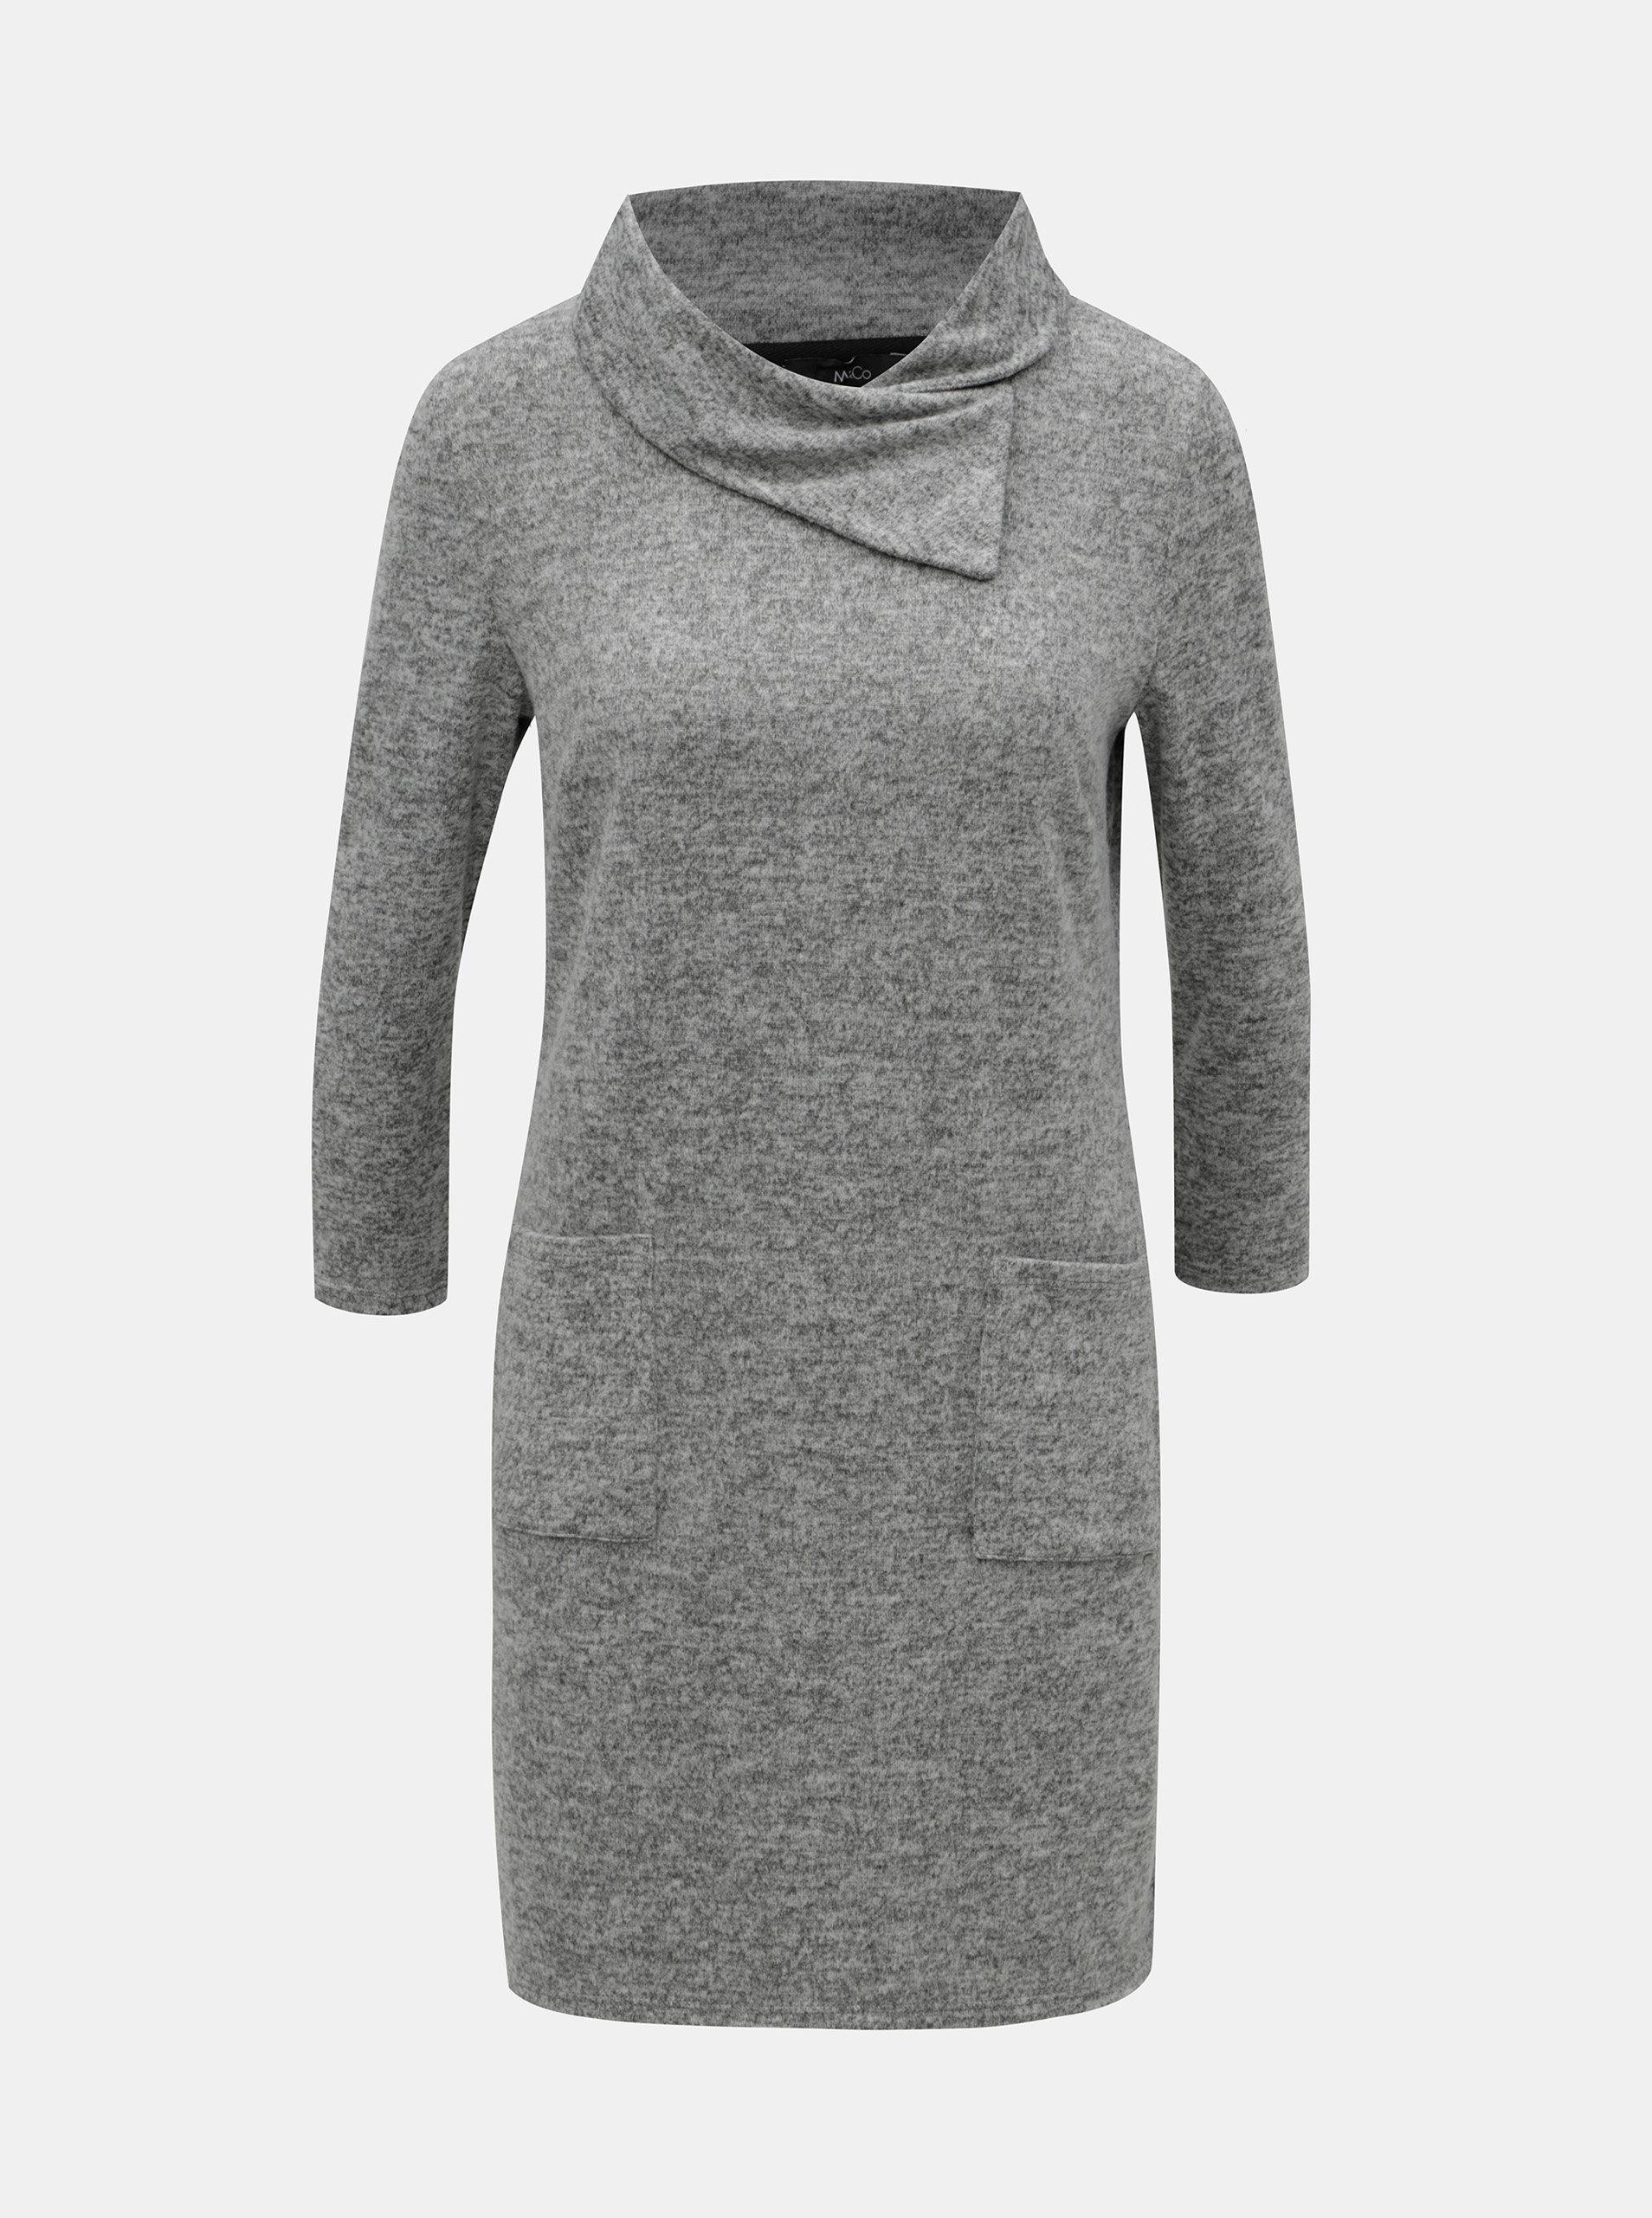 Šedé žíhané svetrové šaty s rolákem a 3 4 rukávem M Co ... 7b238423bc2